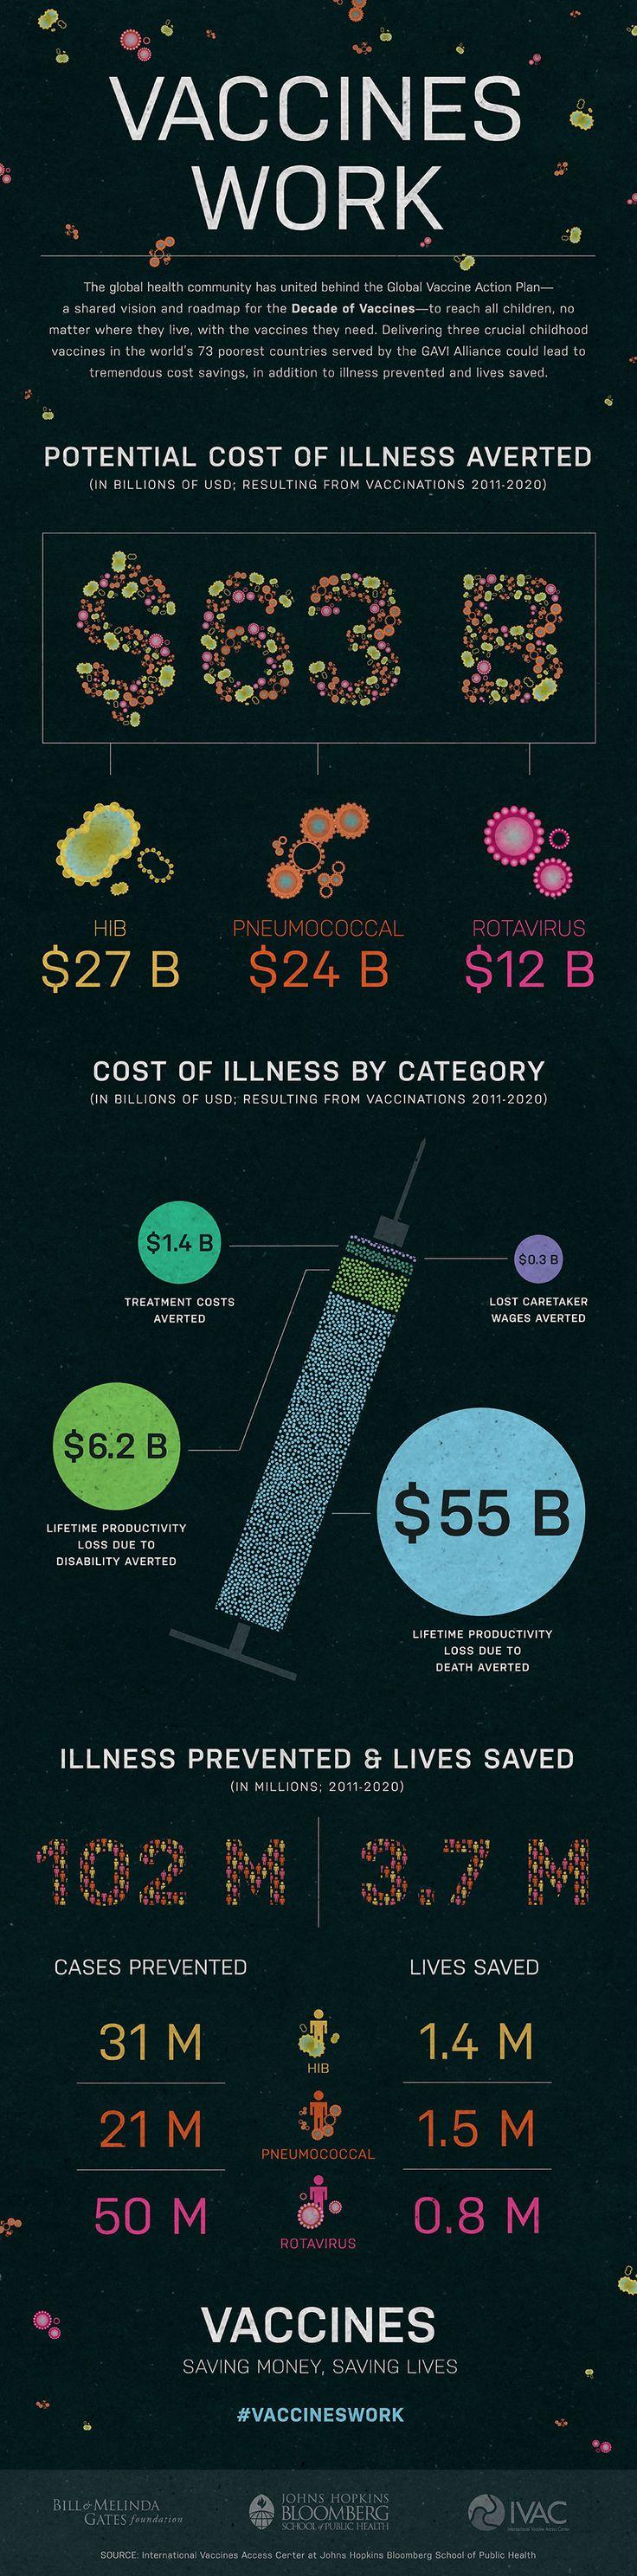 Average Microbiologist Salary